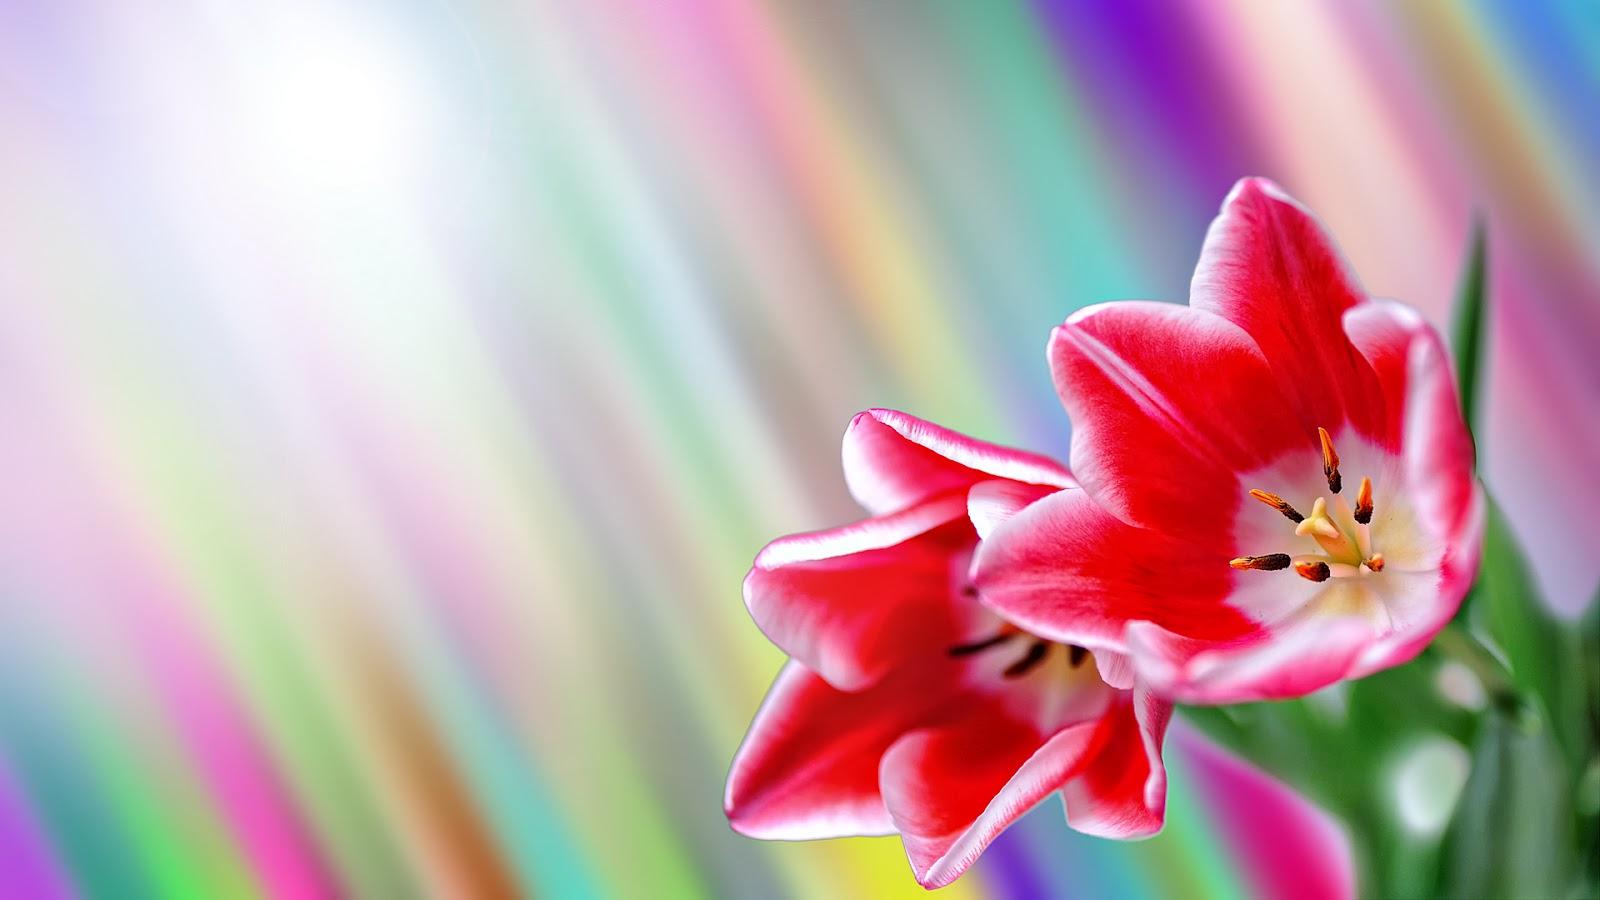 http://4.bp.blogspot.com/-tkb2wCbOnKA/T1RS5SugvuI/AAAAAAAACCk/7pNi0IEXB-s/s1600/spring_by_windylife-d3aib68.jpg